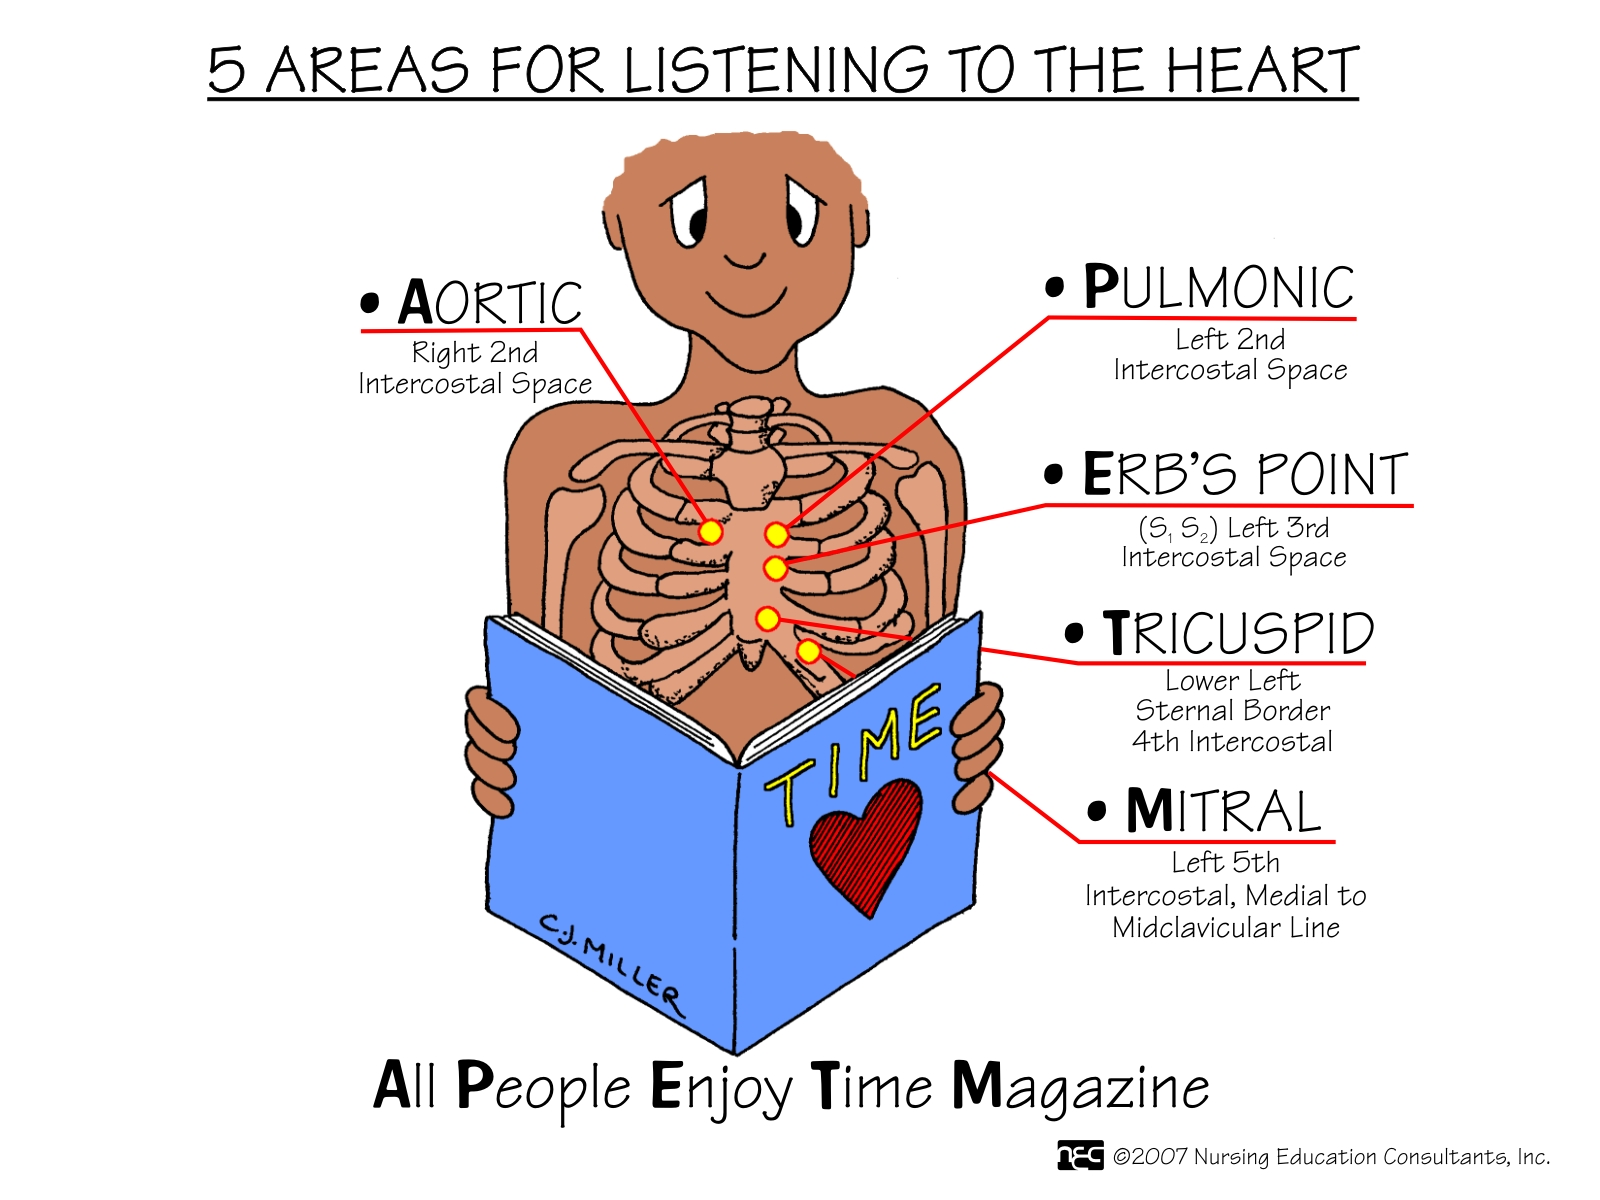 pmi knowledge areas diagram 2009 chevy aveo radio wiring nursing school: assessment mnemonics